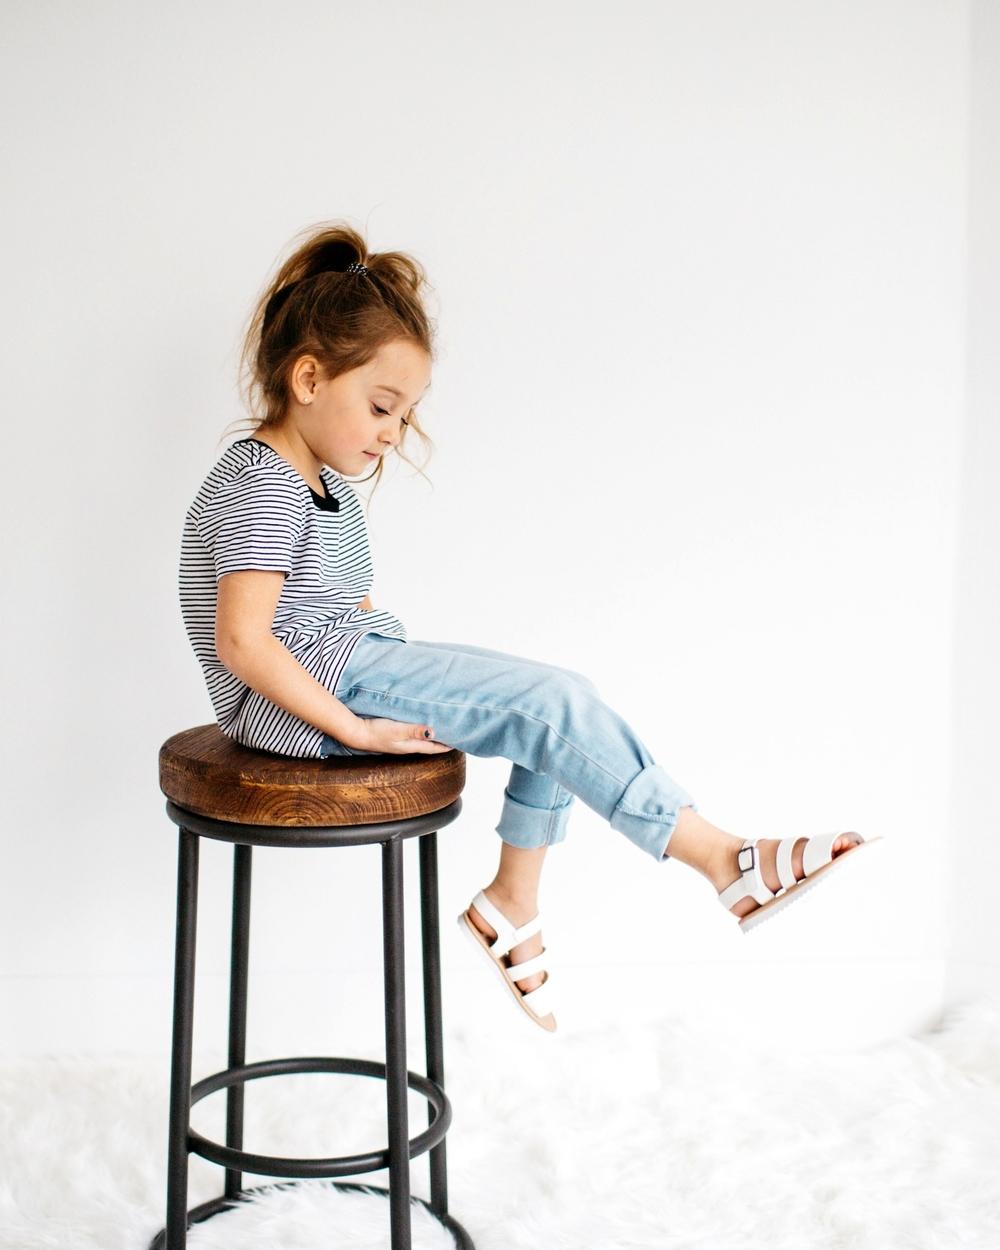 Children Indoor Lifestyle Session Rockford Photographer_0032.jpg